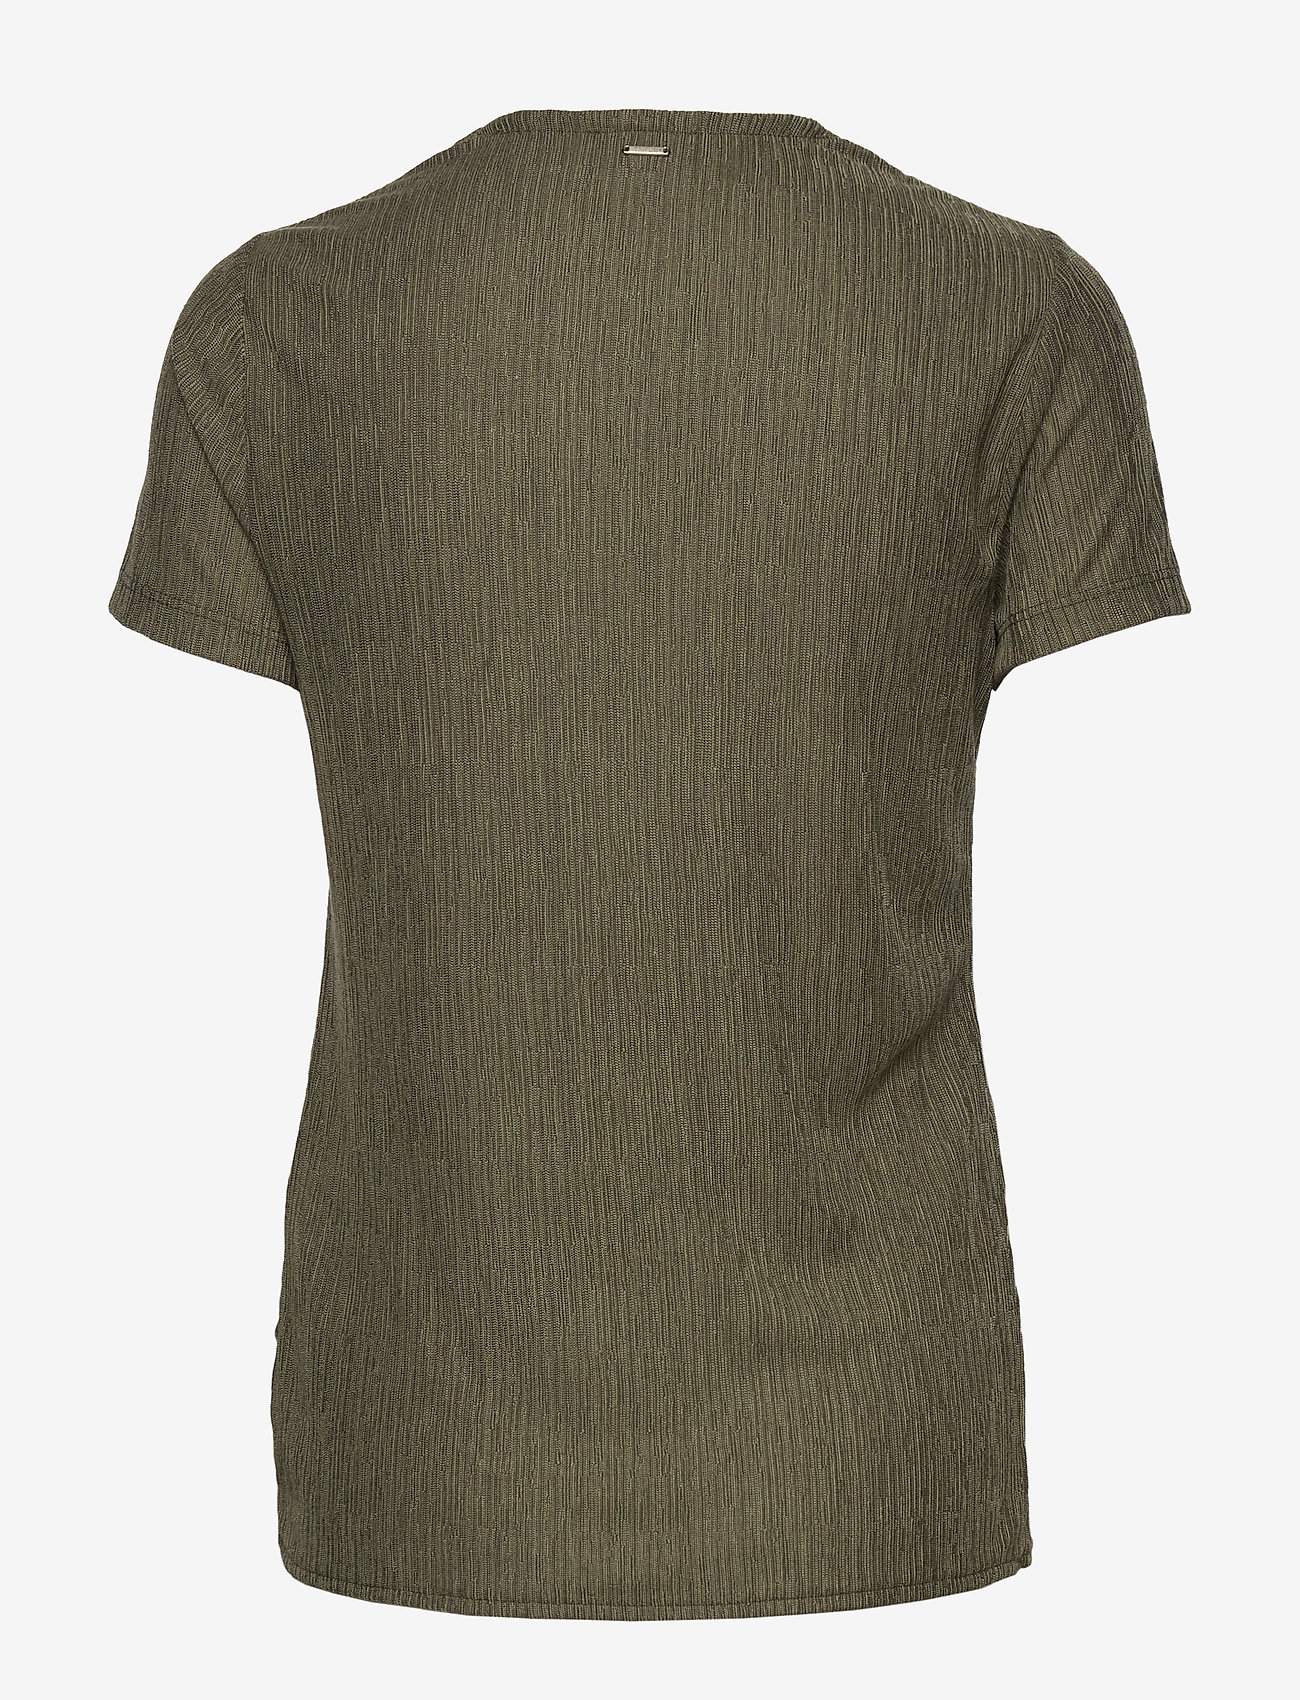 T-shirt Short-sleeve (Soft Khaki) (44.99 €) - Taifun 8s9mJ